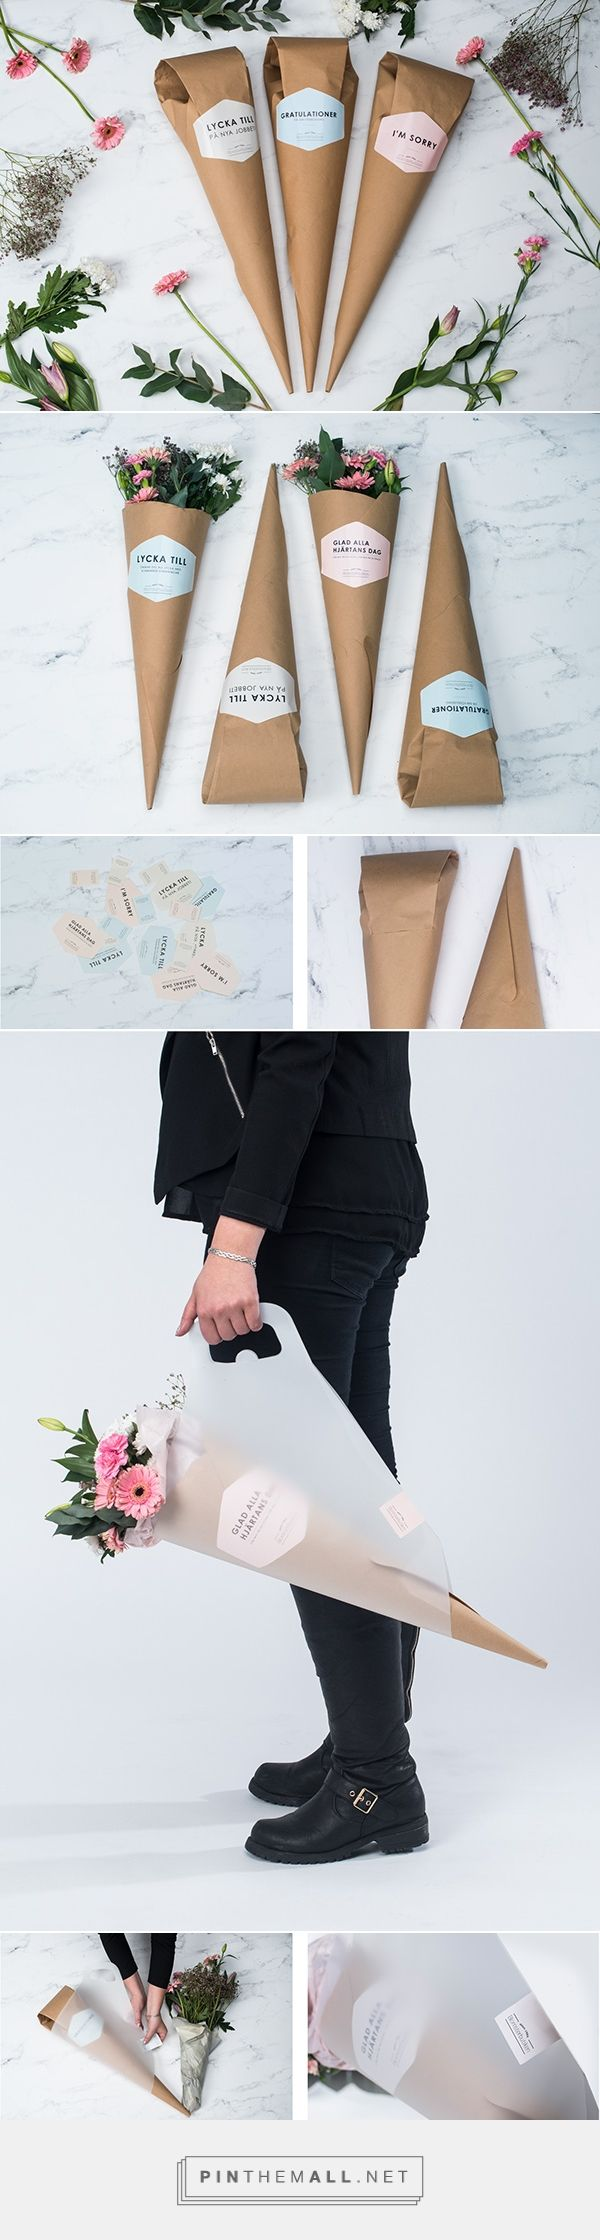 Design packaging packaging specialist packaging - Flower Packaging On Packaging Design Served Created Via Https Pinthemall Net